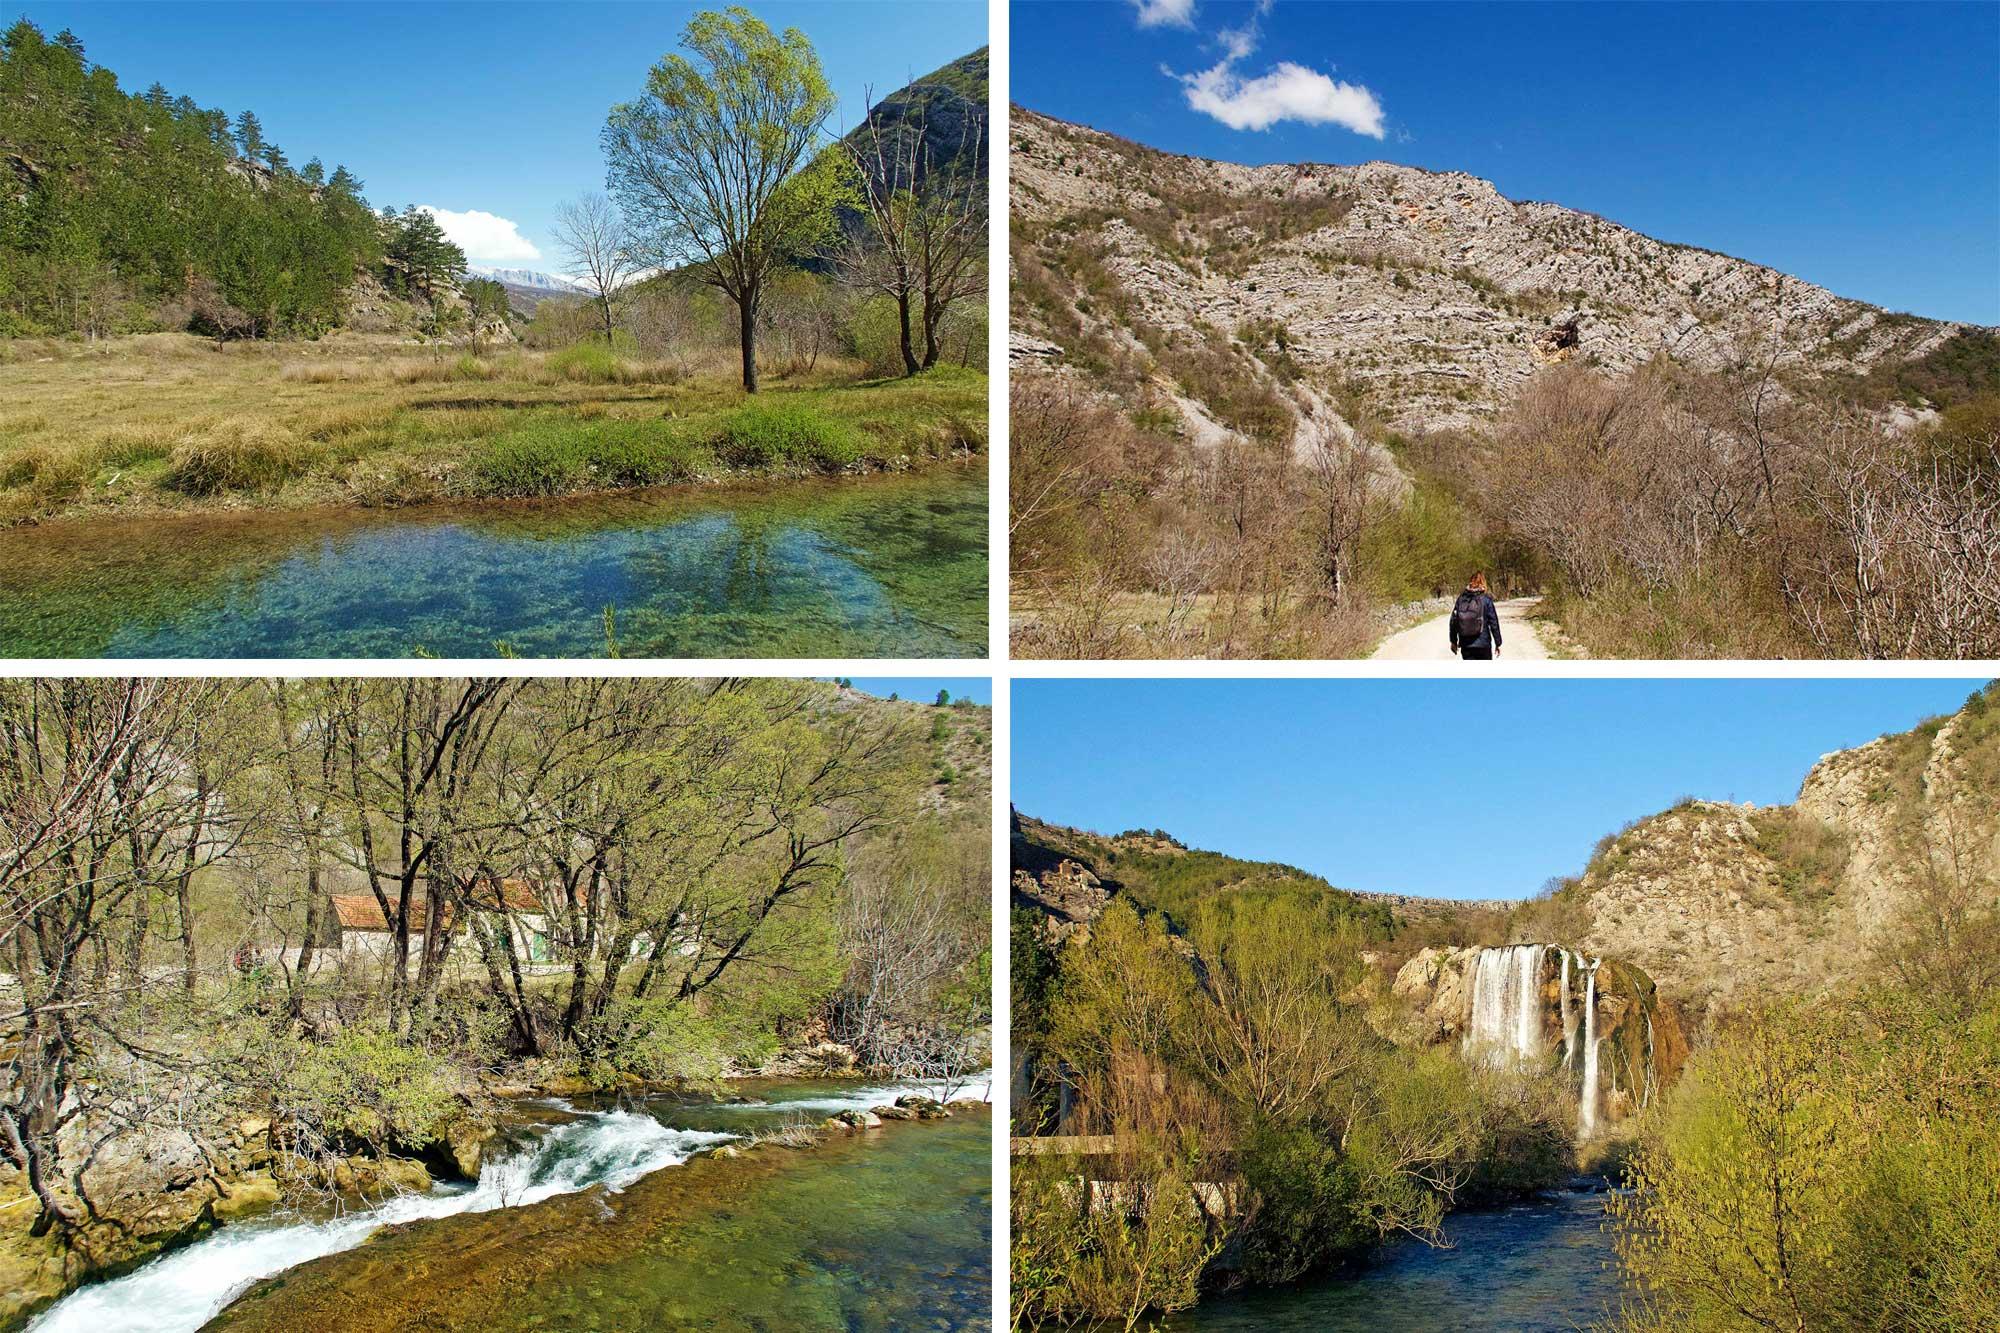 Izlet na rijeku Krčić